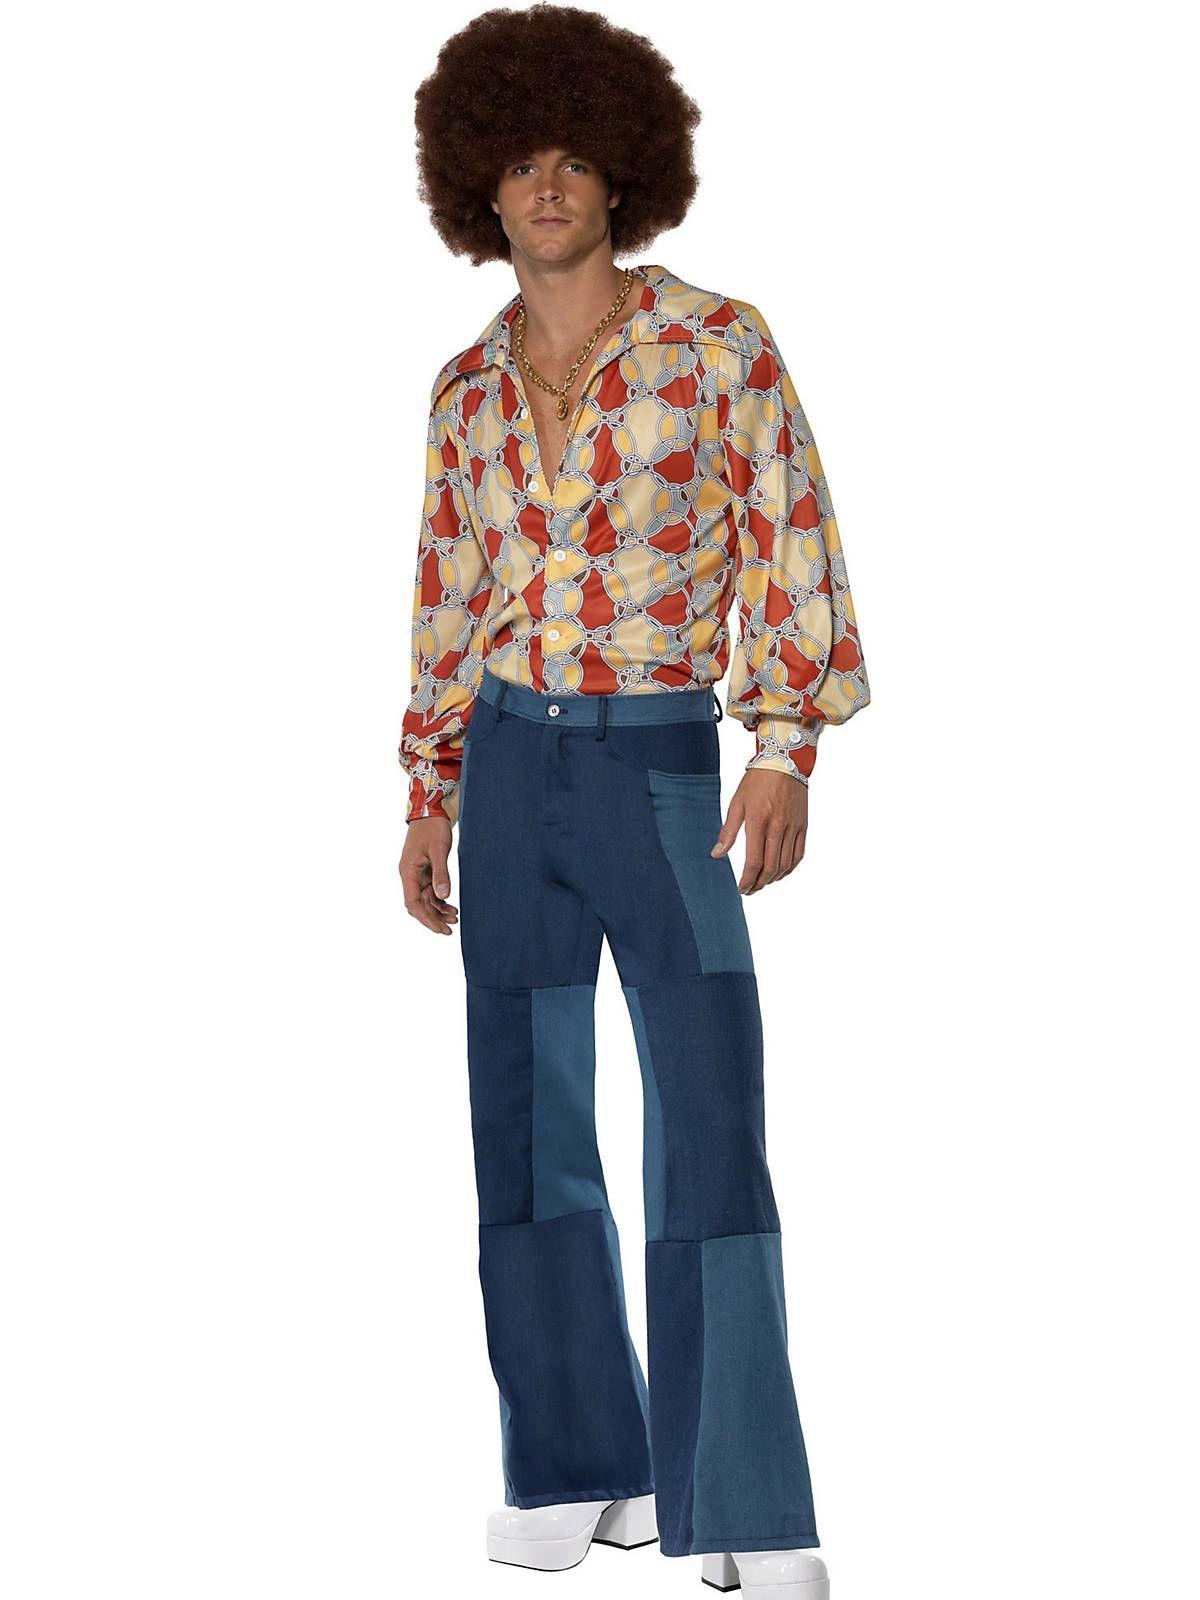 fd9be80c 70s Retro Costume   Wholesale 70s Costumes for Men   jacob costumes ...